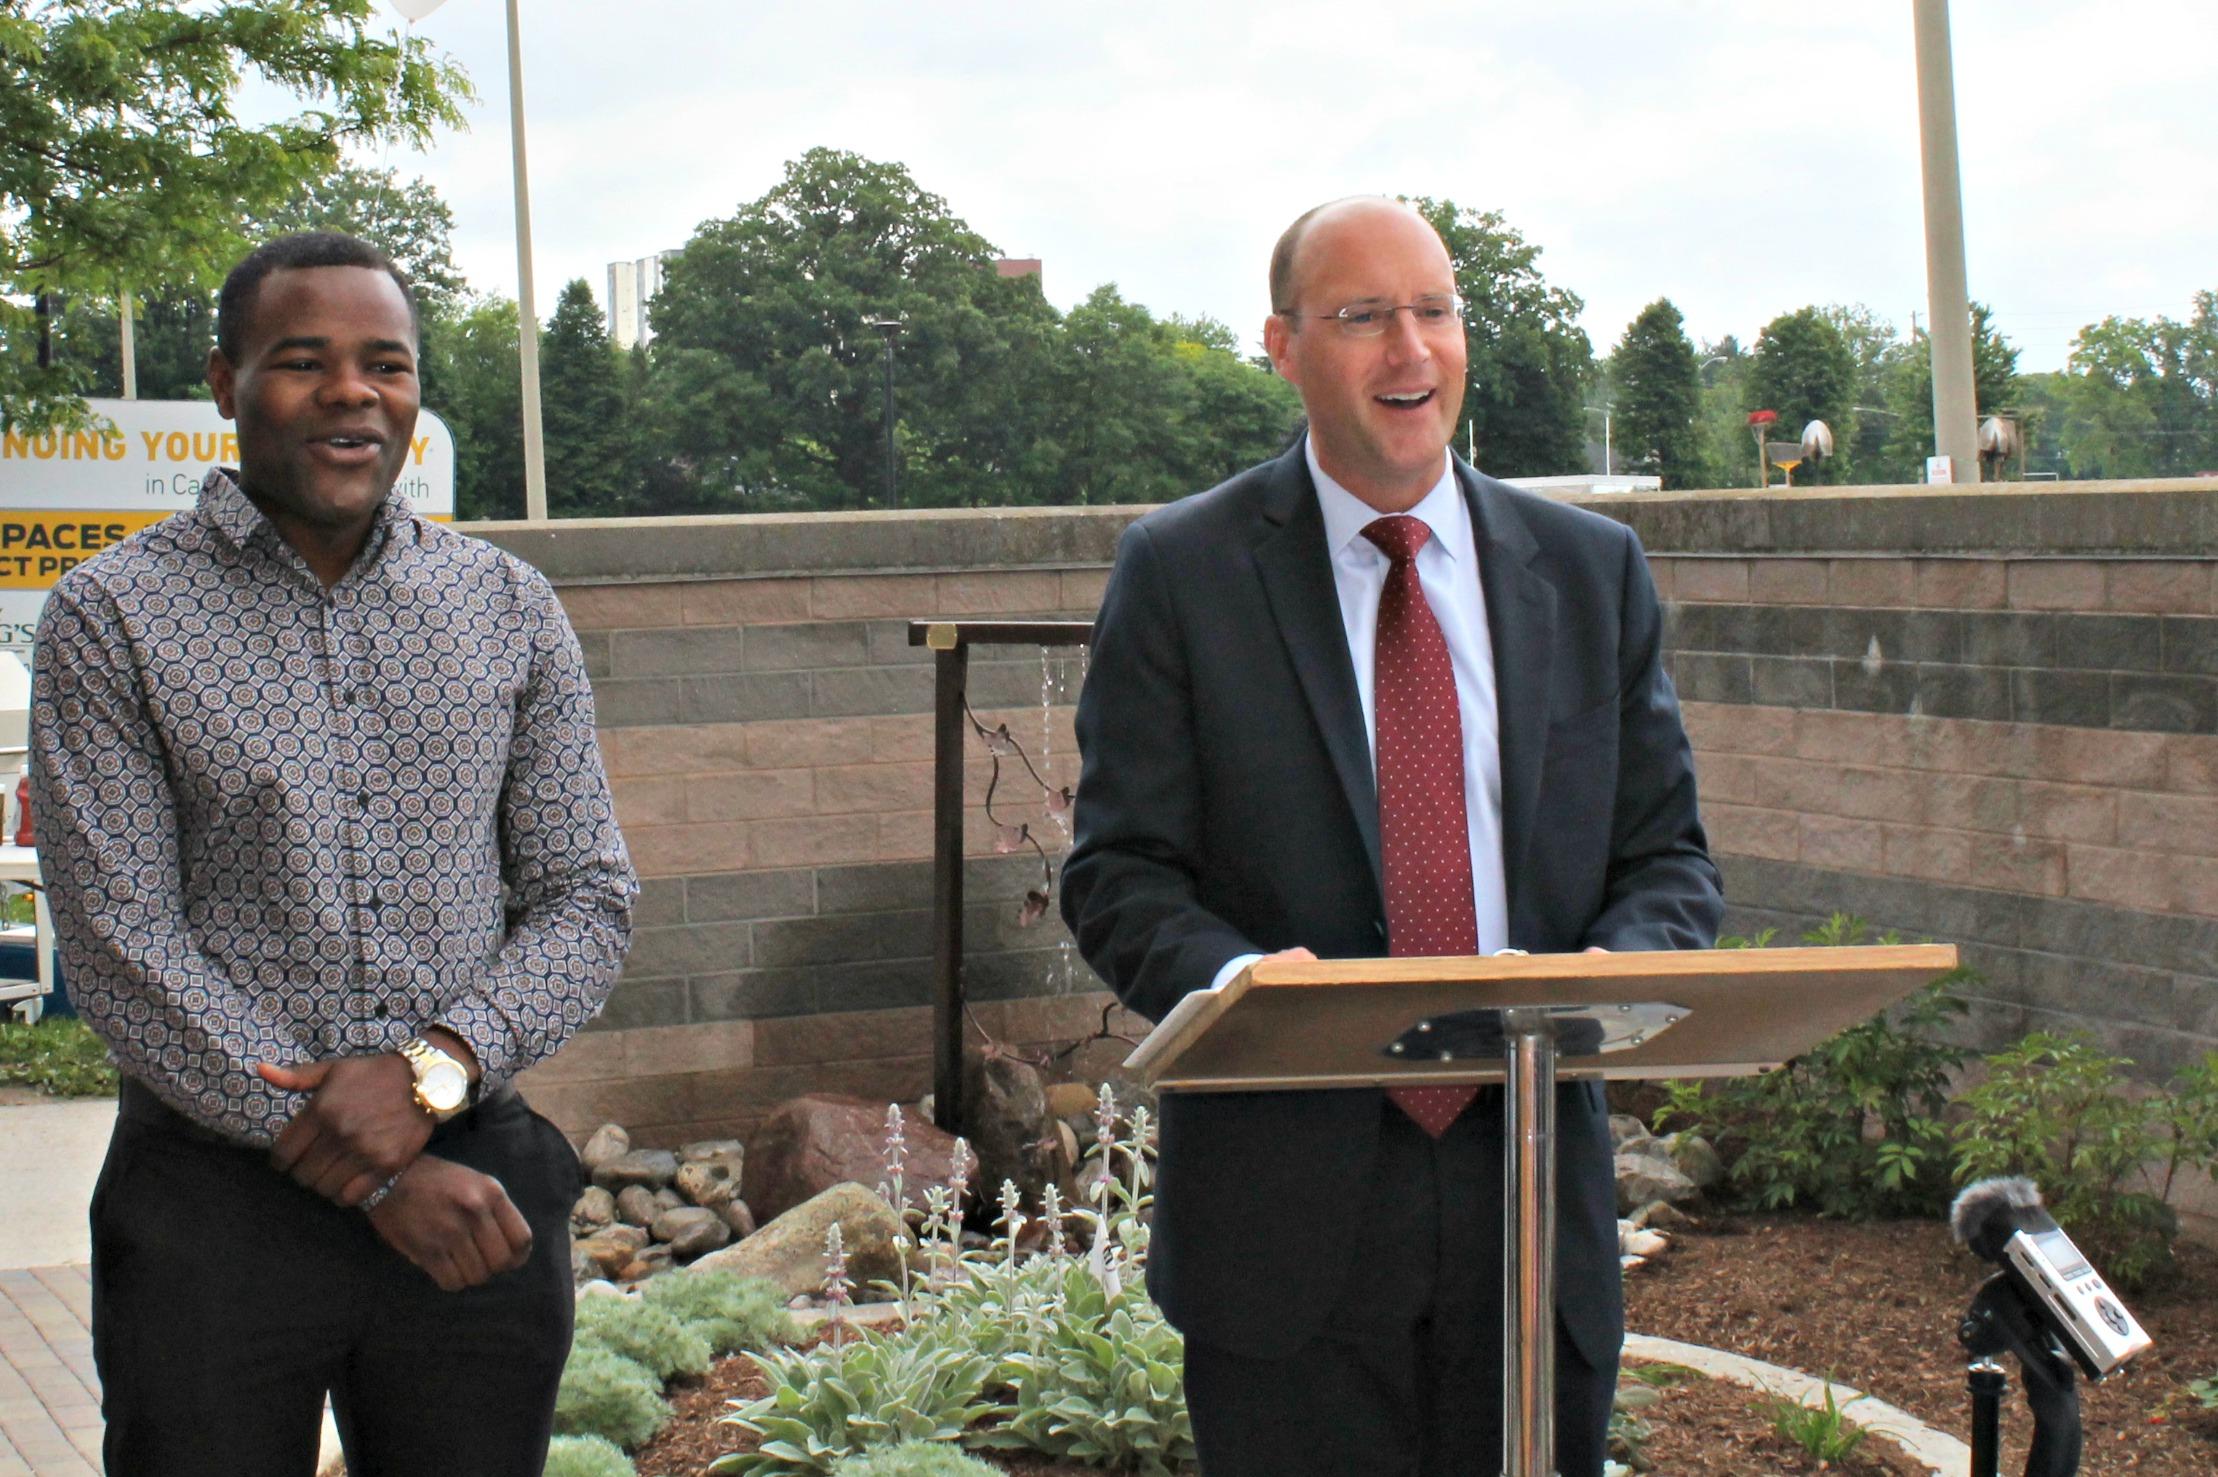 City of London Mayor Matt Brown (Right) with City Councillor Mo Salih (Left)